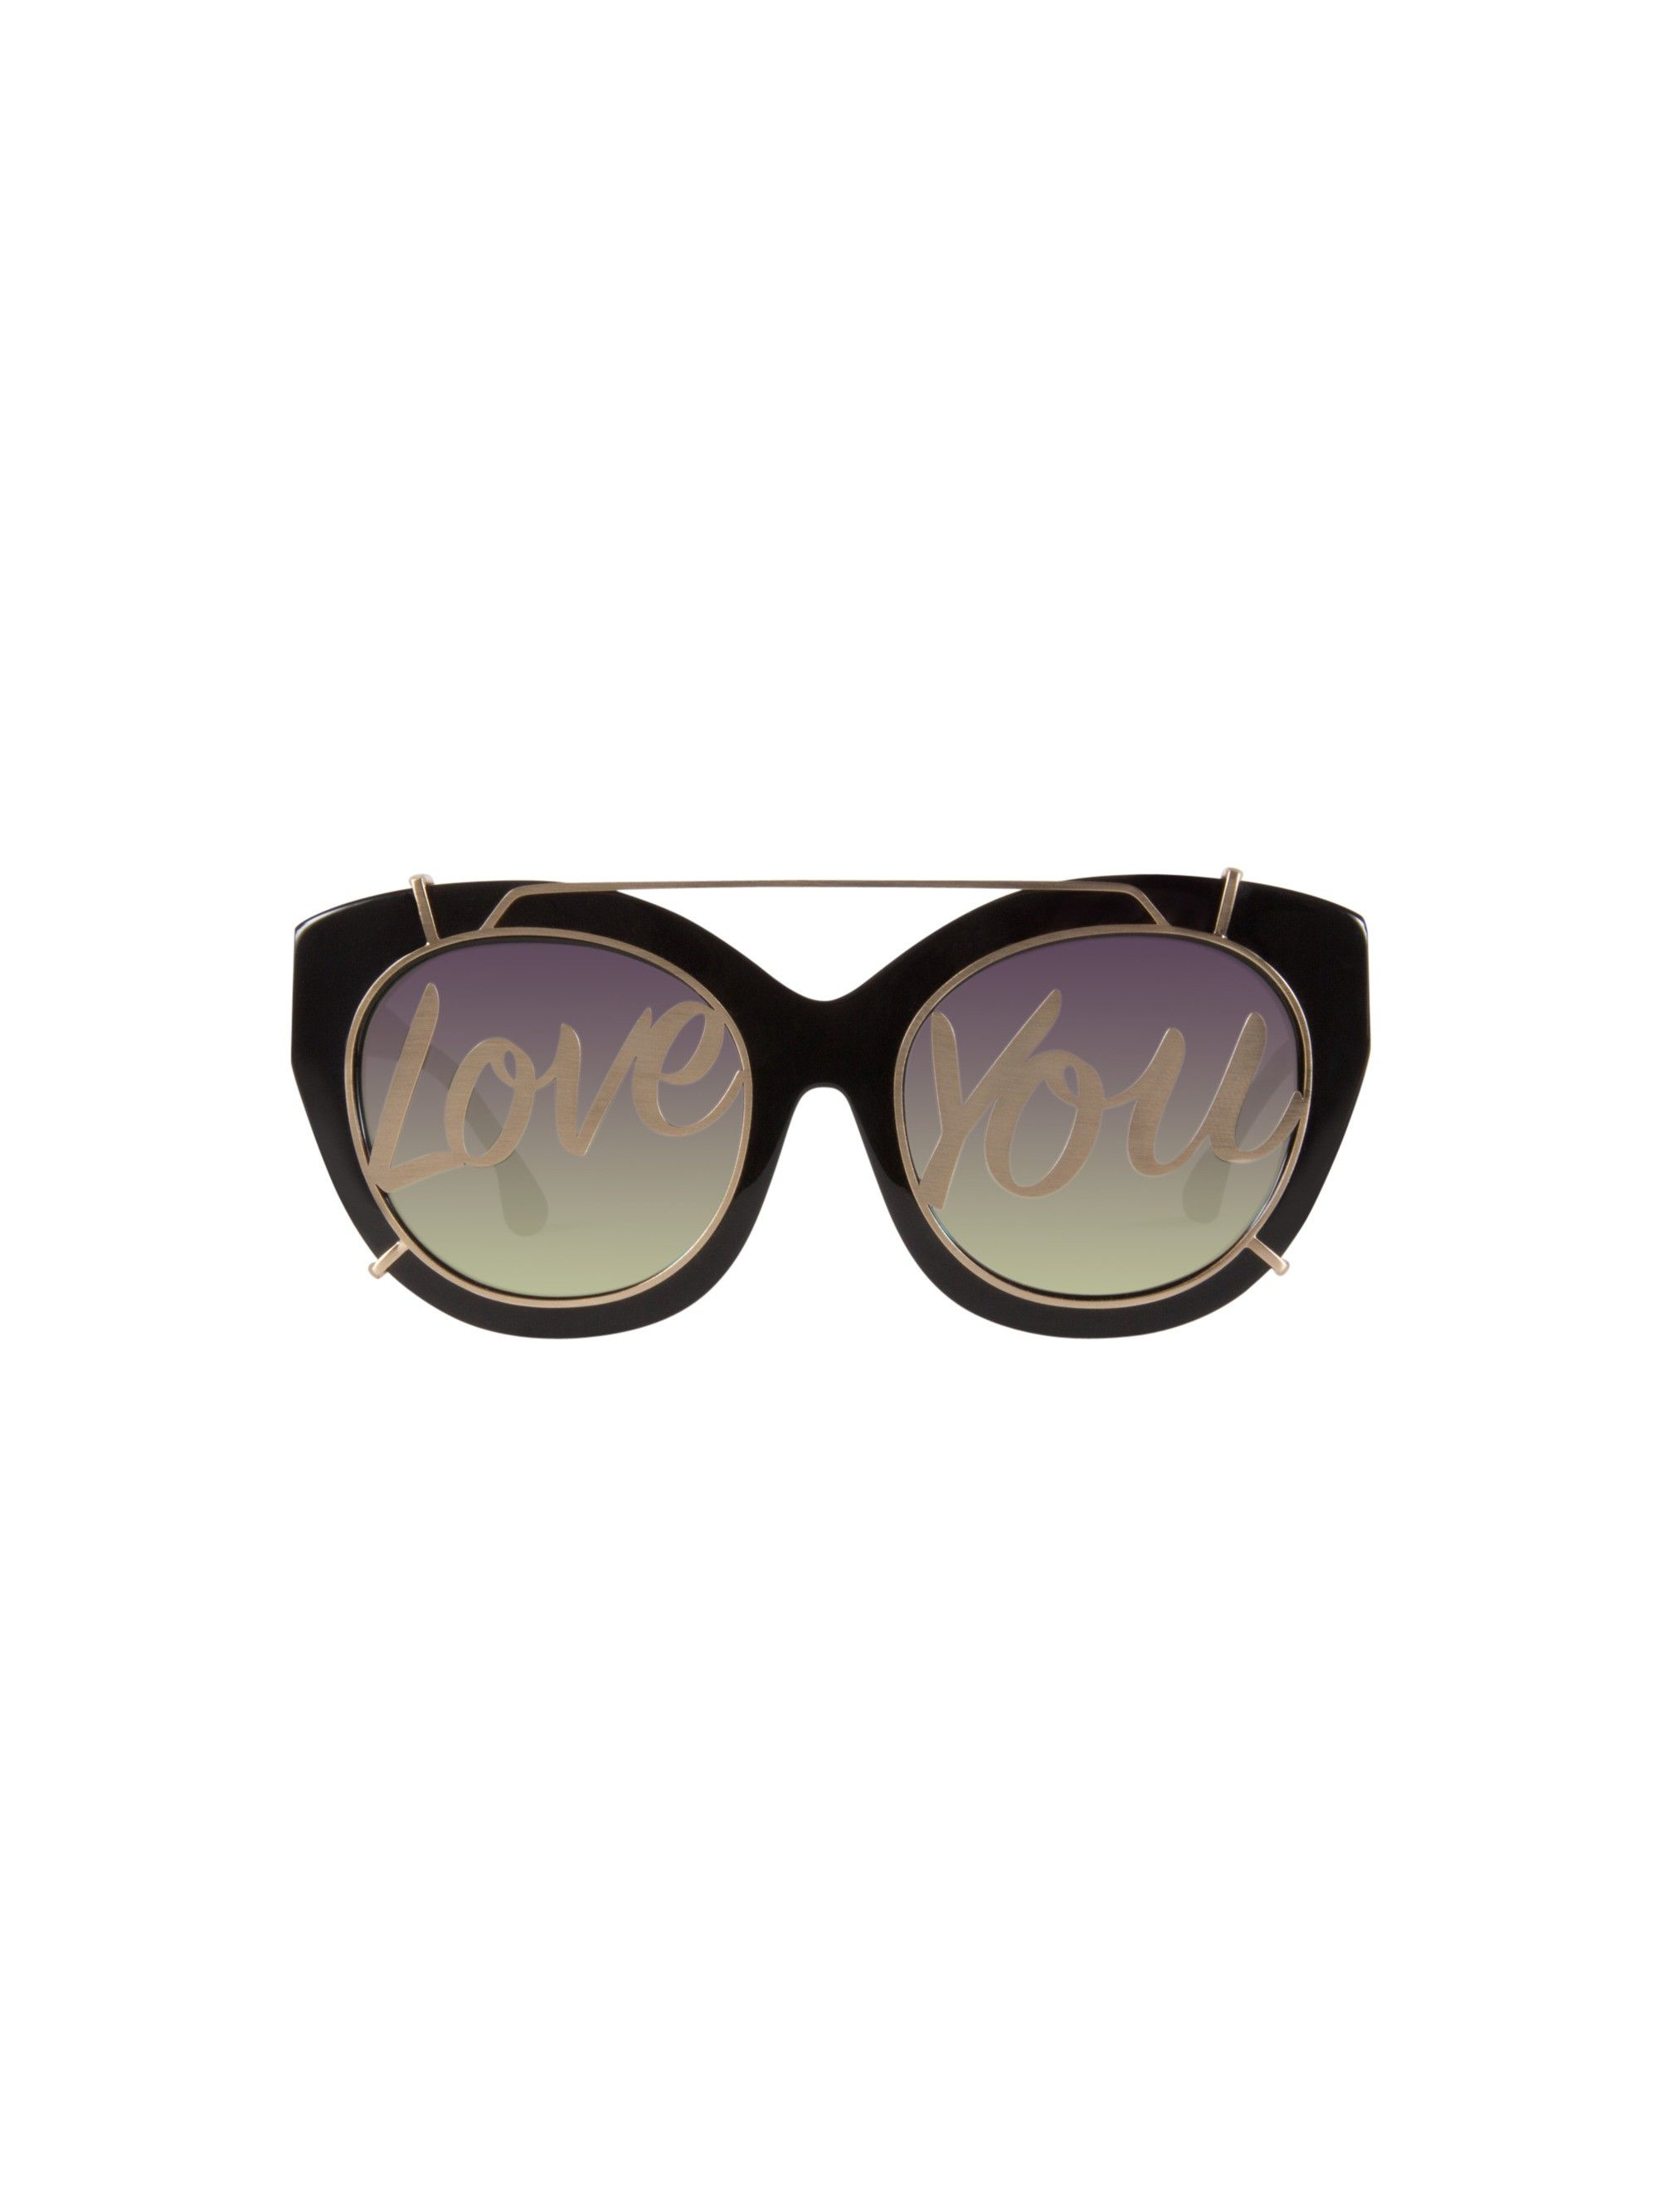 Walker Cat-eye Glittered Acetate And Gold-tone Sunglasses - Charcoal Alice & Olivia 567S0